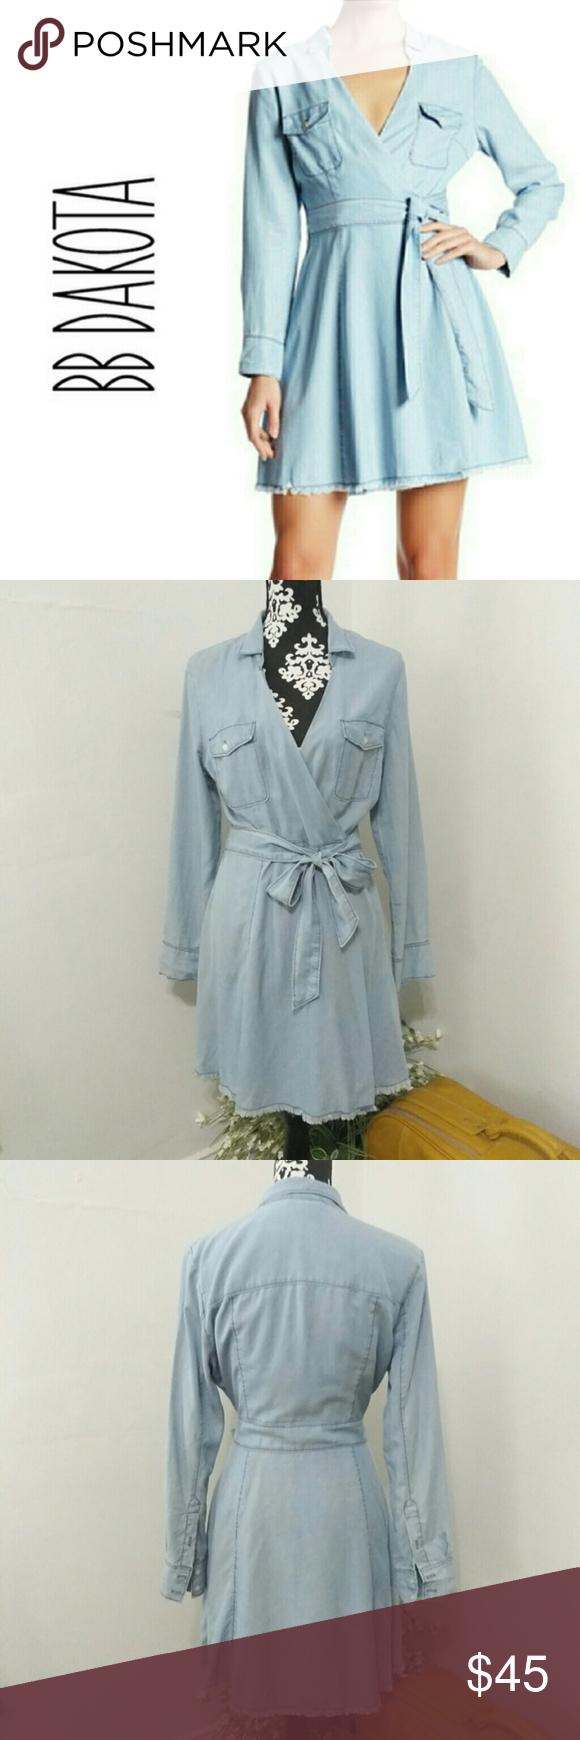 Bb dakota chambray gennesse long sleeve wrap dress in my posh